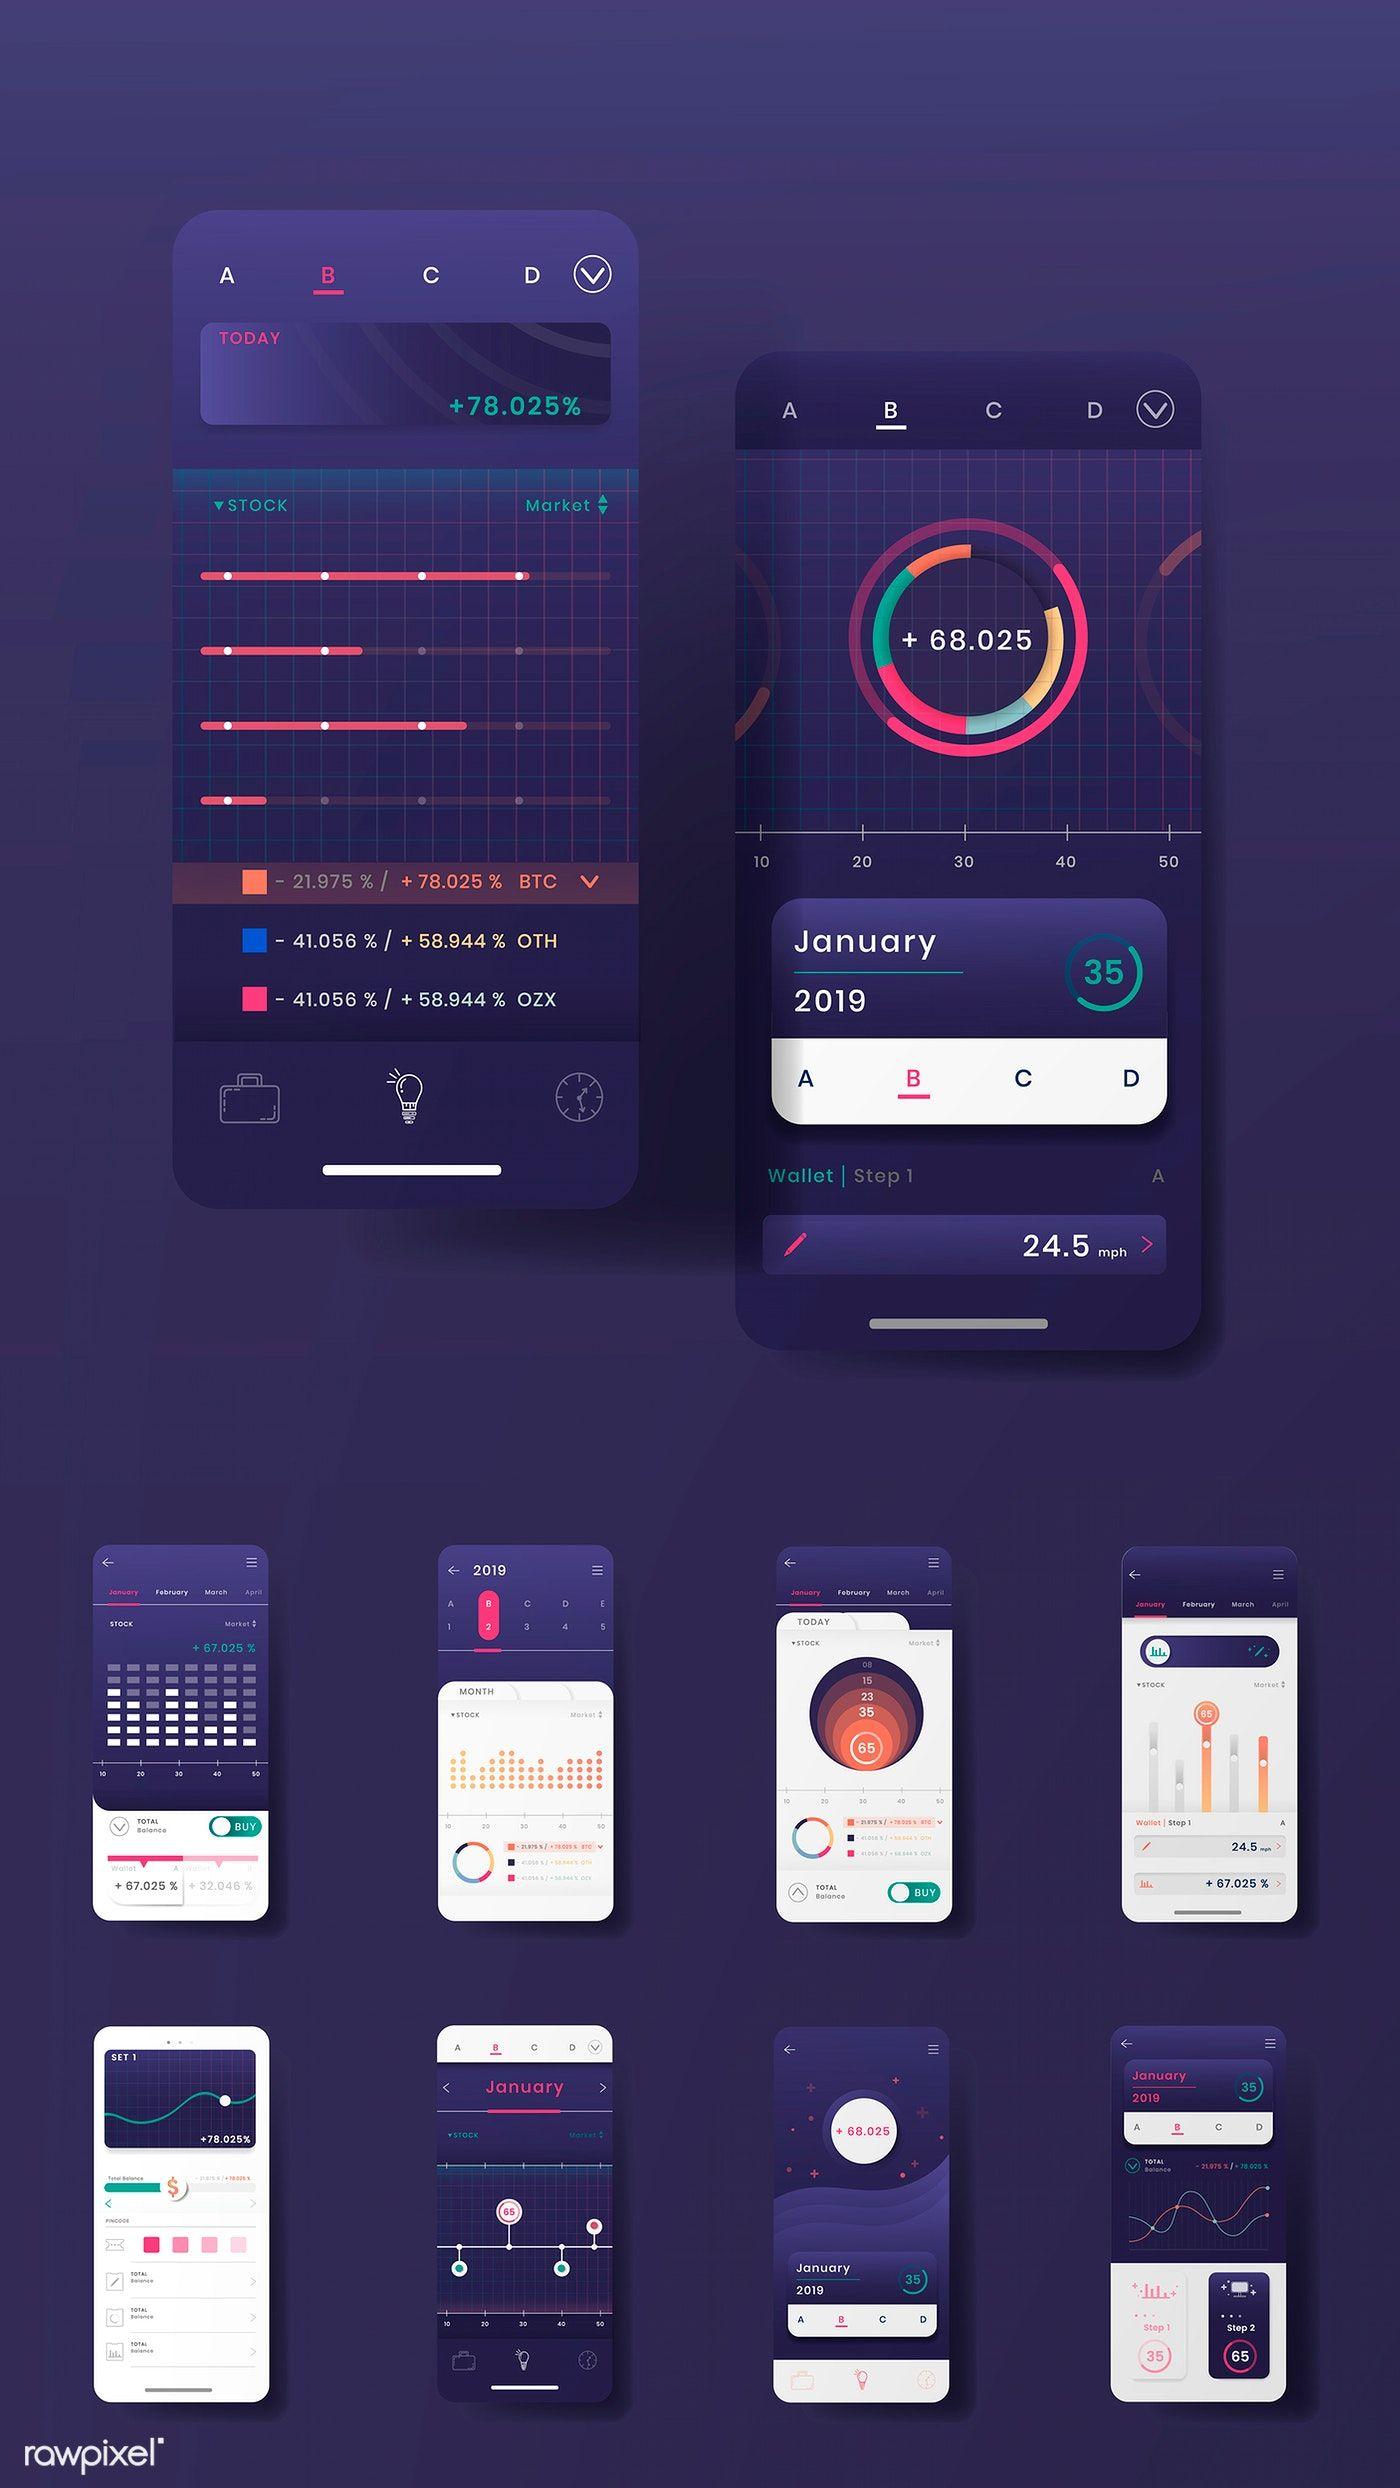 Download Premium Illustration Of Dark Purple Stock Trading Infographic Infographic Templates Infographic Templates